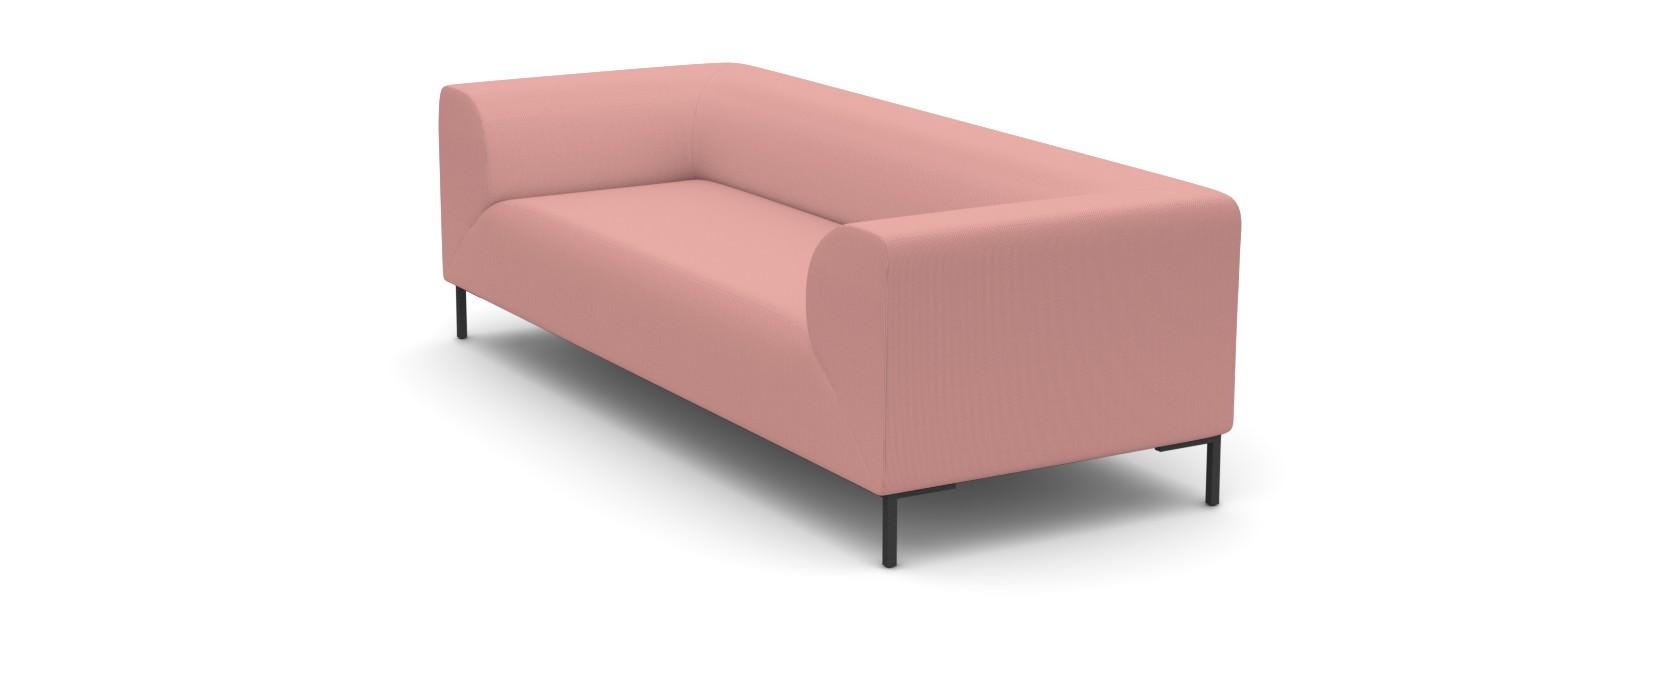 3-Sitzer Sofa Merano